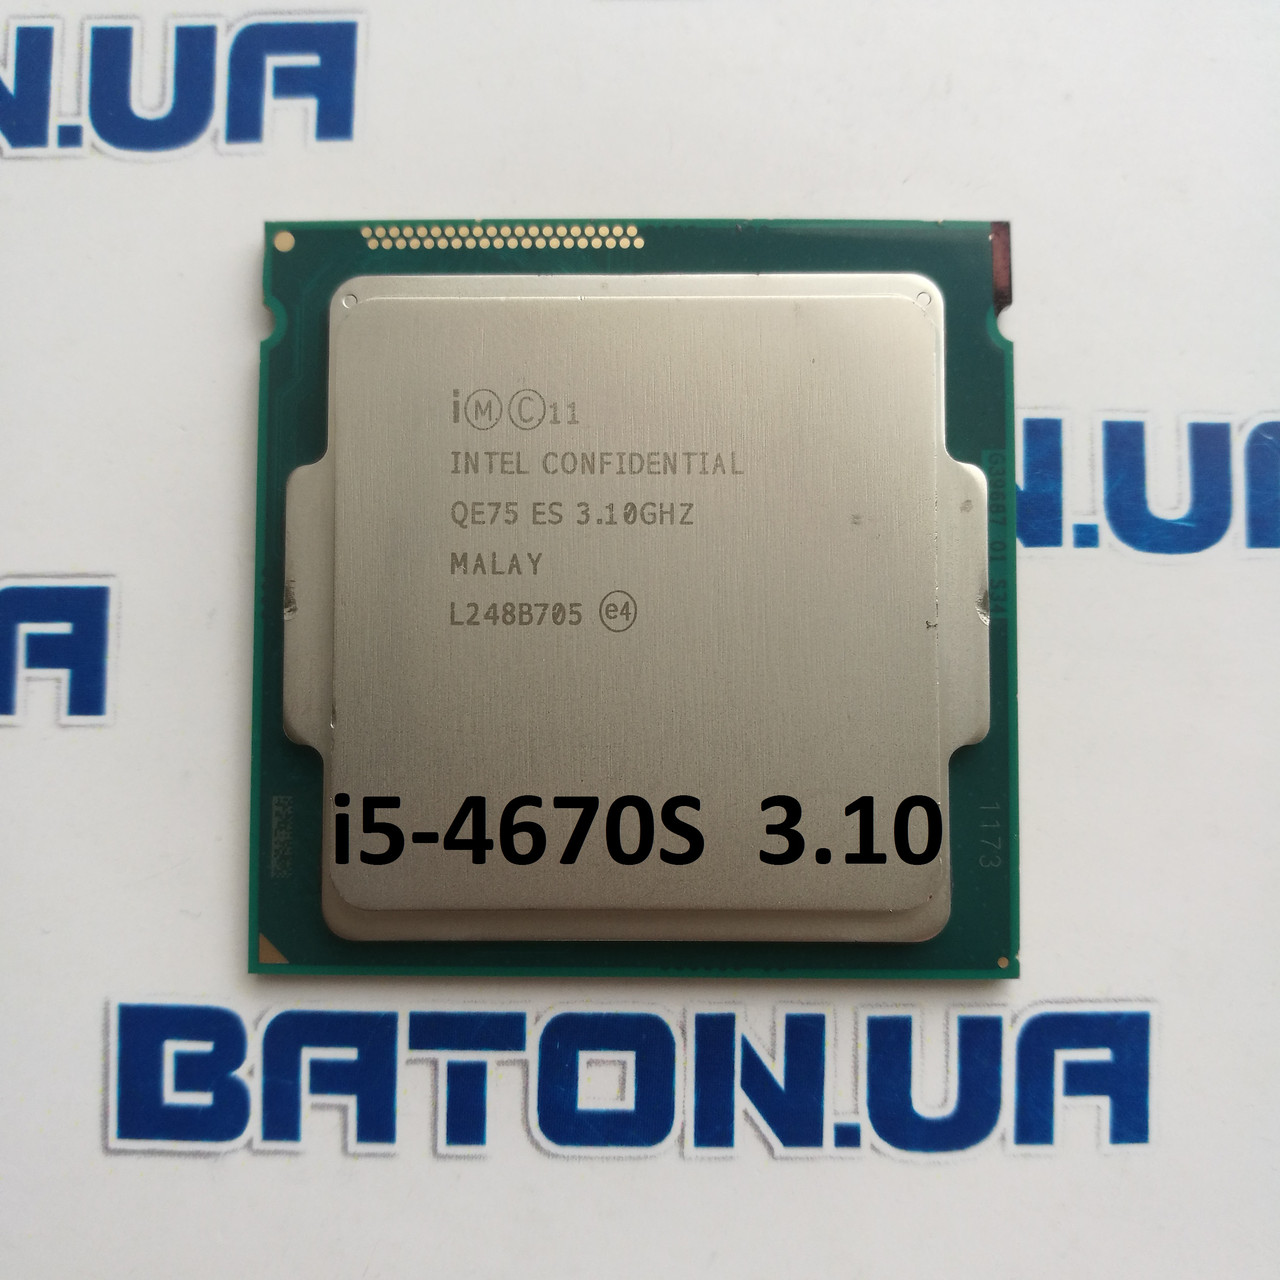 Процессор Intel® Core™ i5-4670S QE75 3.1GHz up 3.8GHz 6M Cache Socket 1150